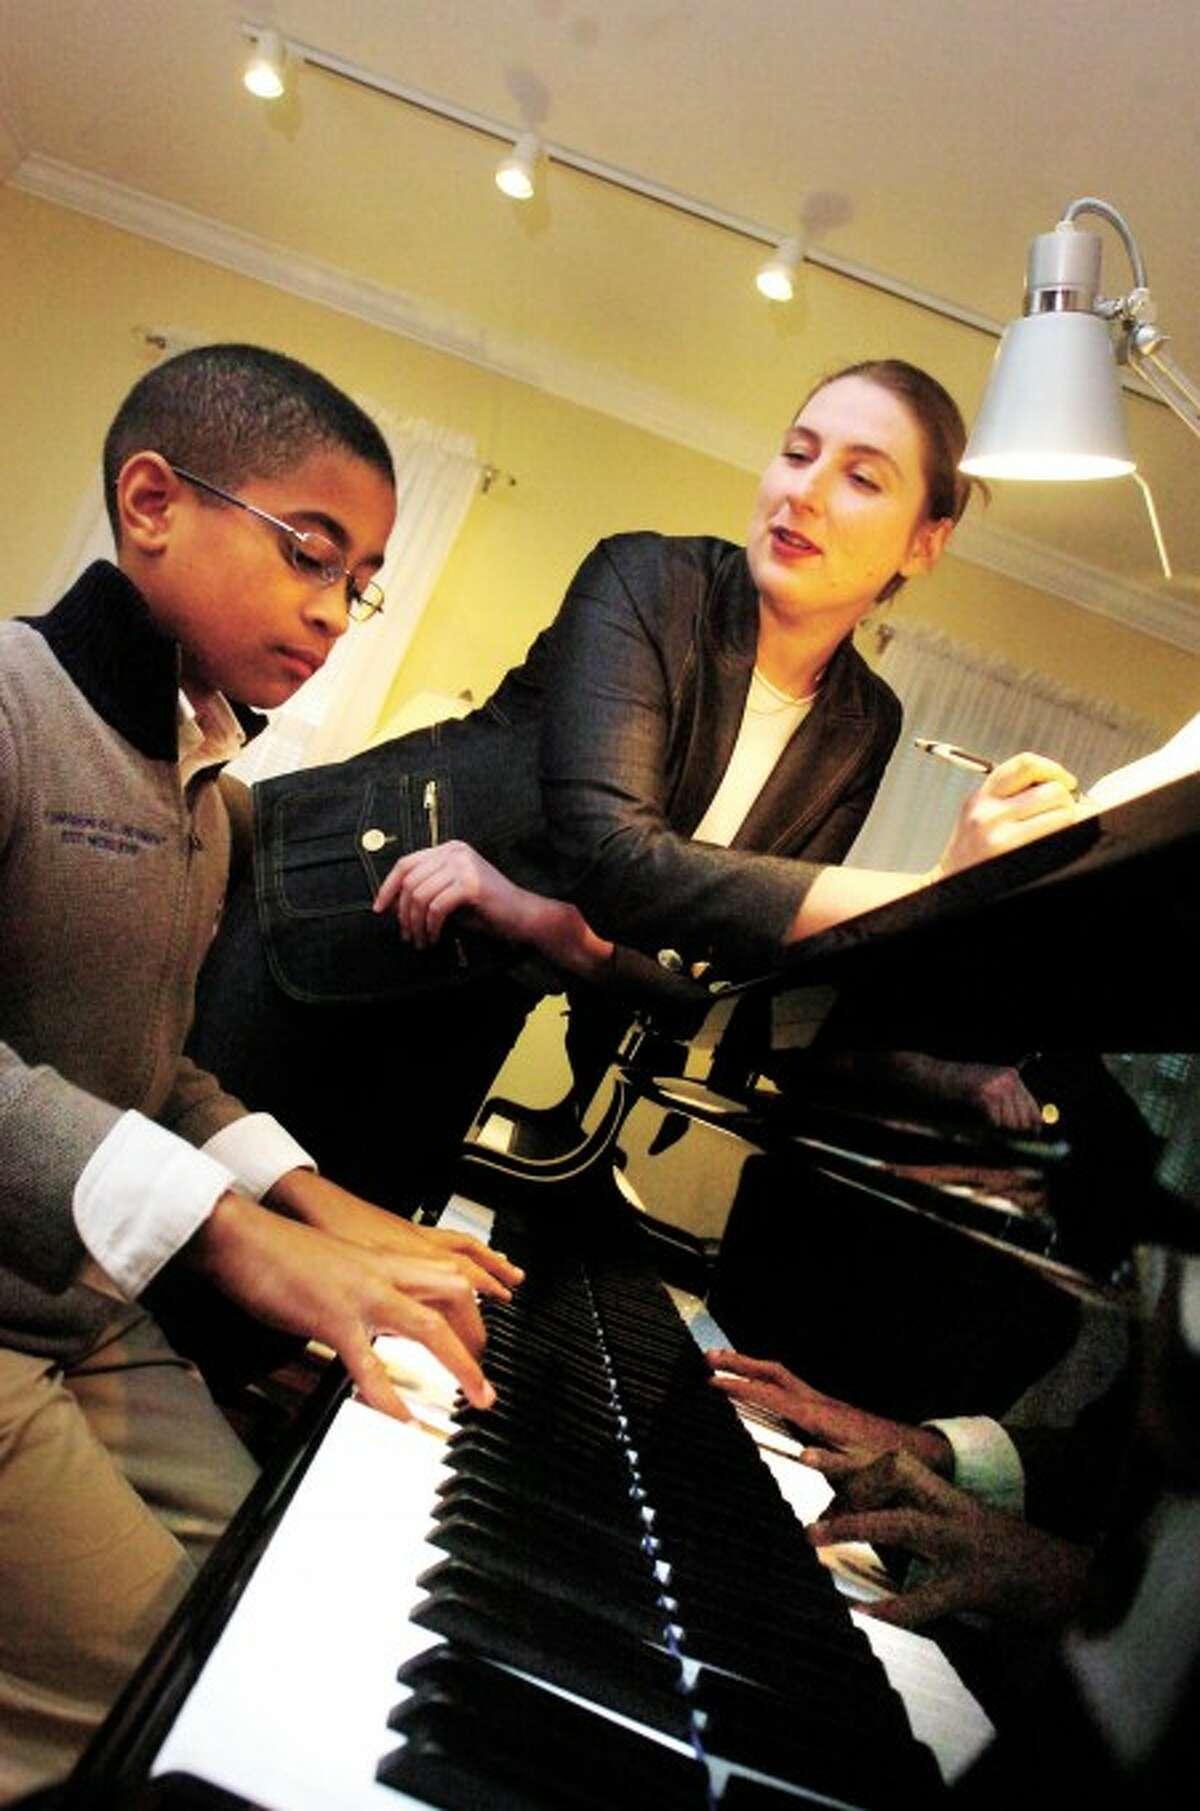 Piano teacher Svitlana Fiorito with 10 year old prodigy Seth Blumer at her studio in Stamford on Tuesday. hour photo/matthew vinci